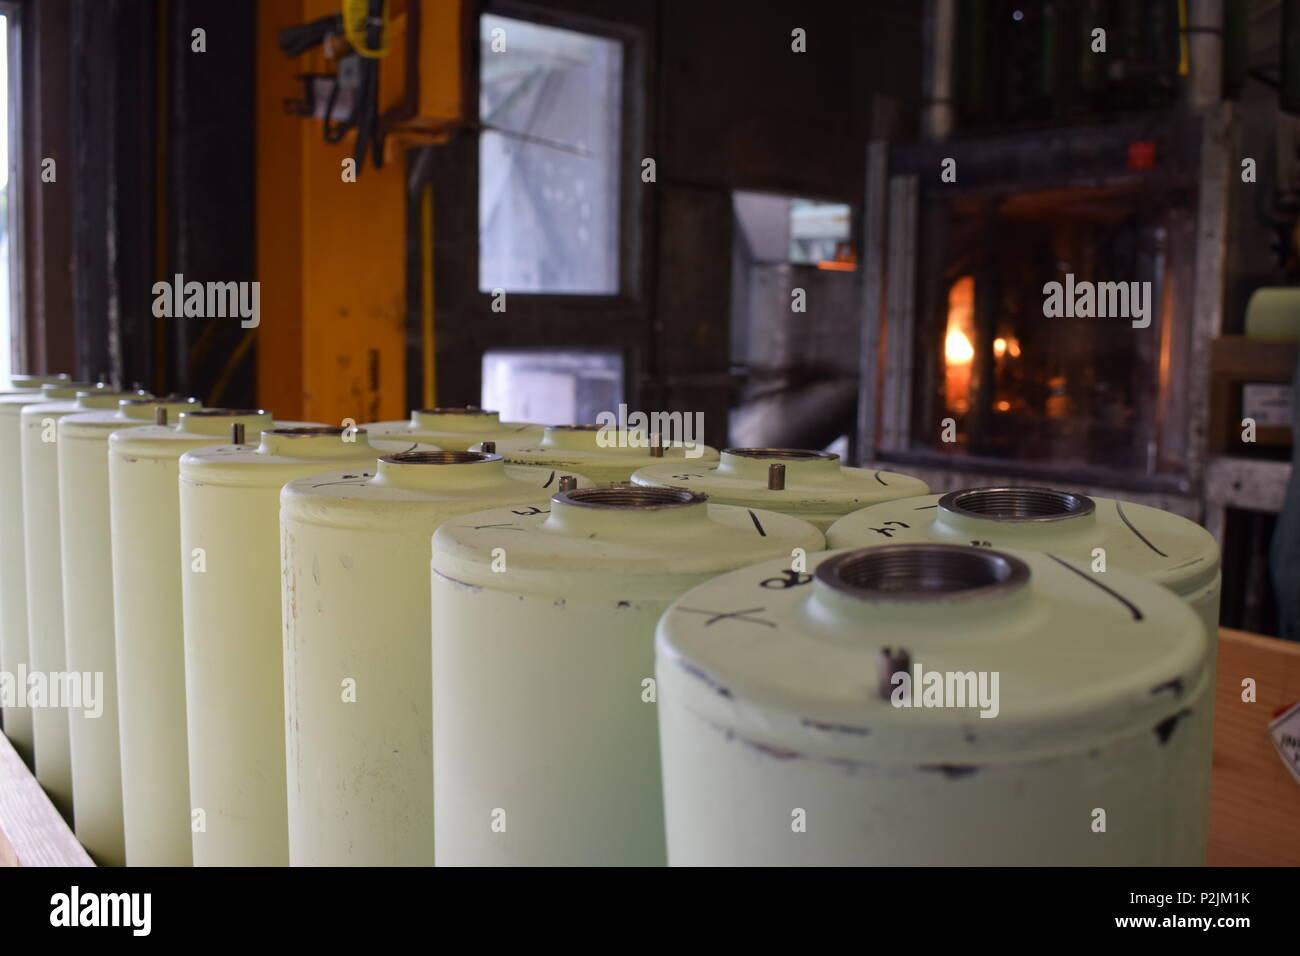 Phosphoric Acid Stock Photos & Phosphoric Acid Stock Images - Alamy